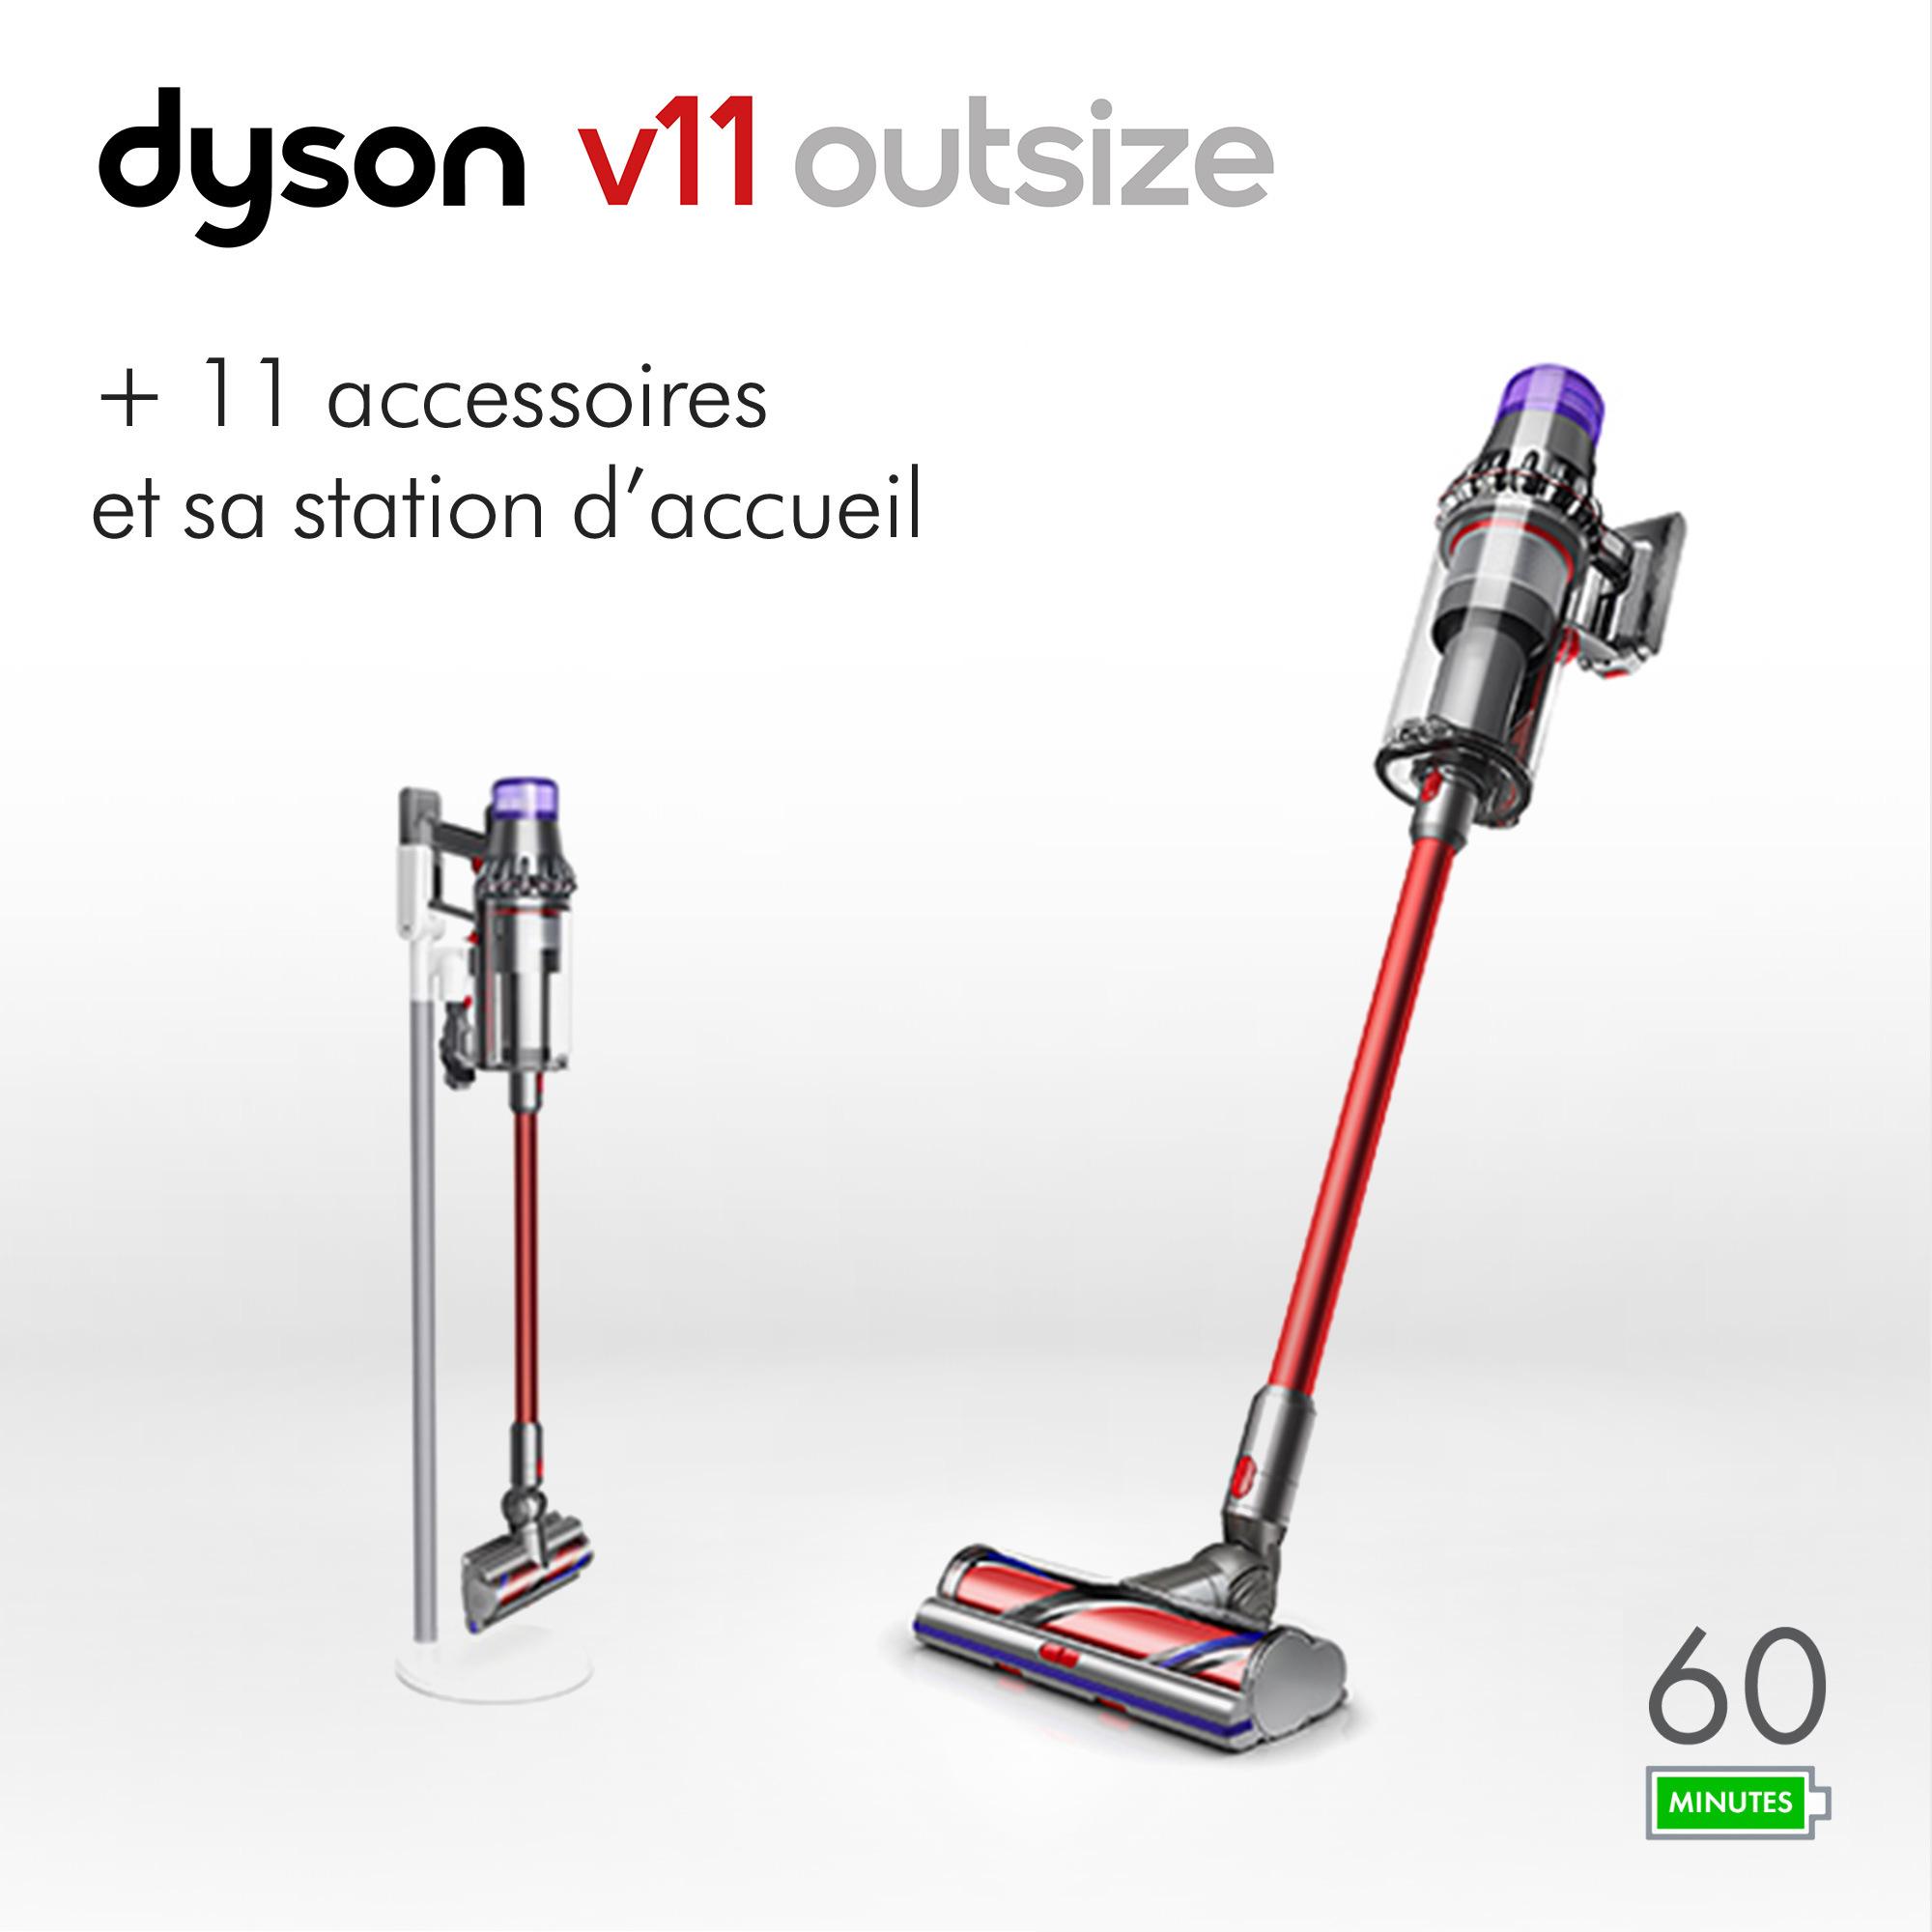 Aspirateur balais Dyson V11 Outsize + station d'accueil